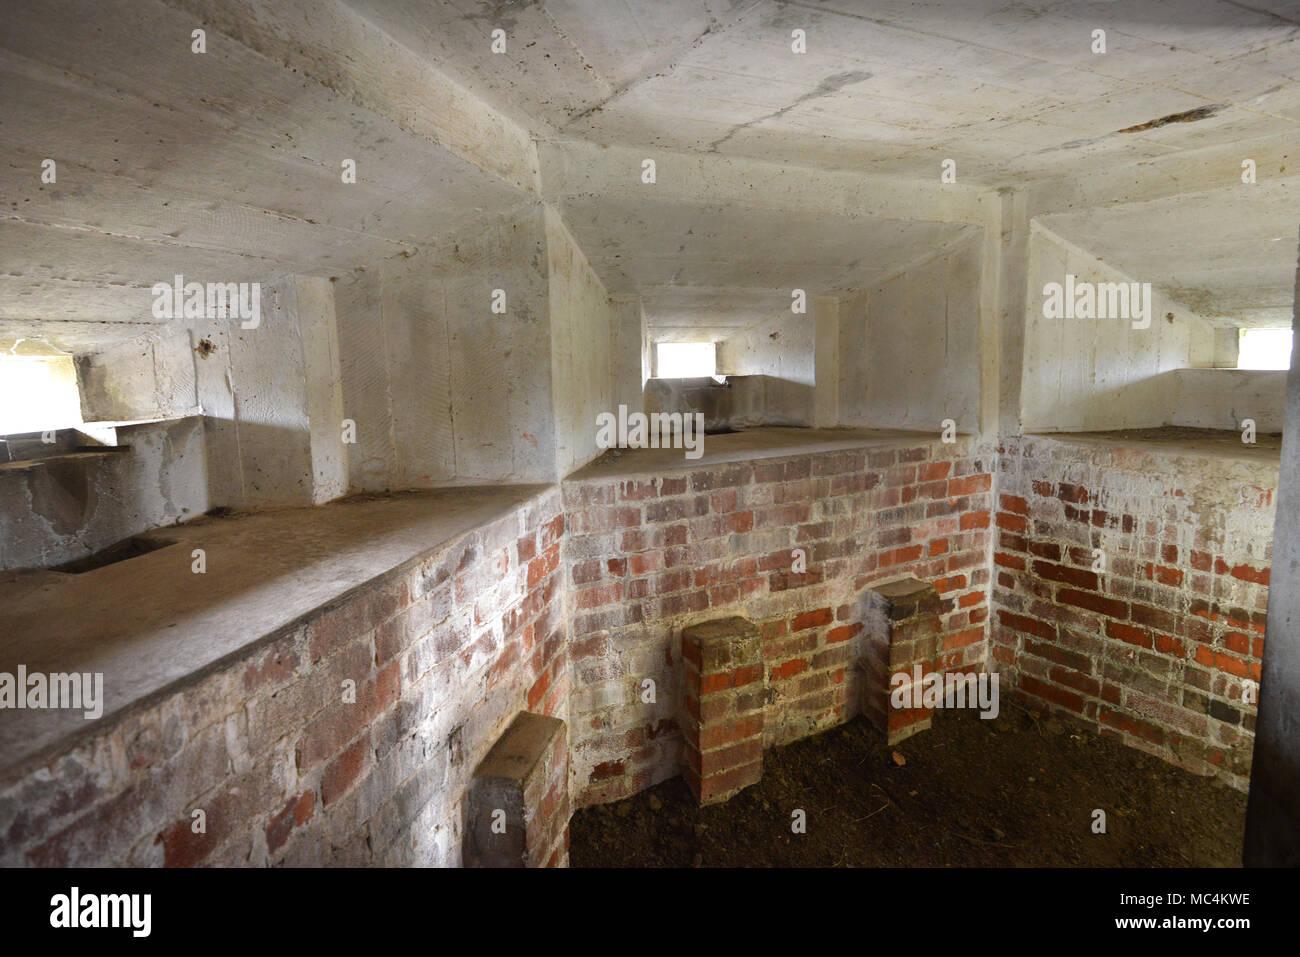 Interior of pillbox - WWII defensive gun emplacement - Stock Image